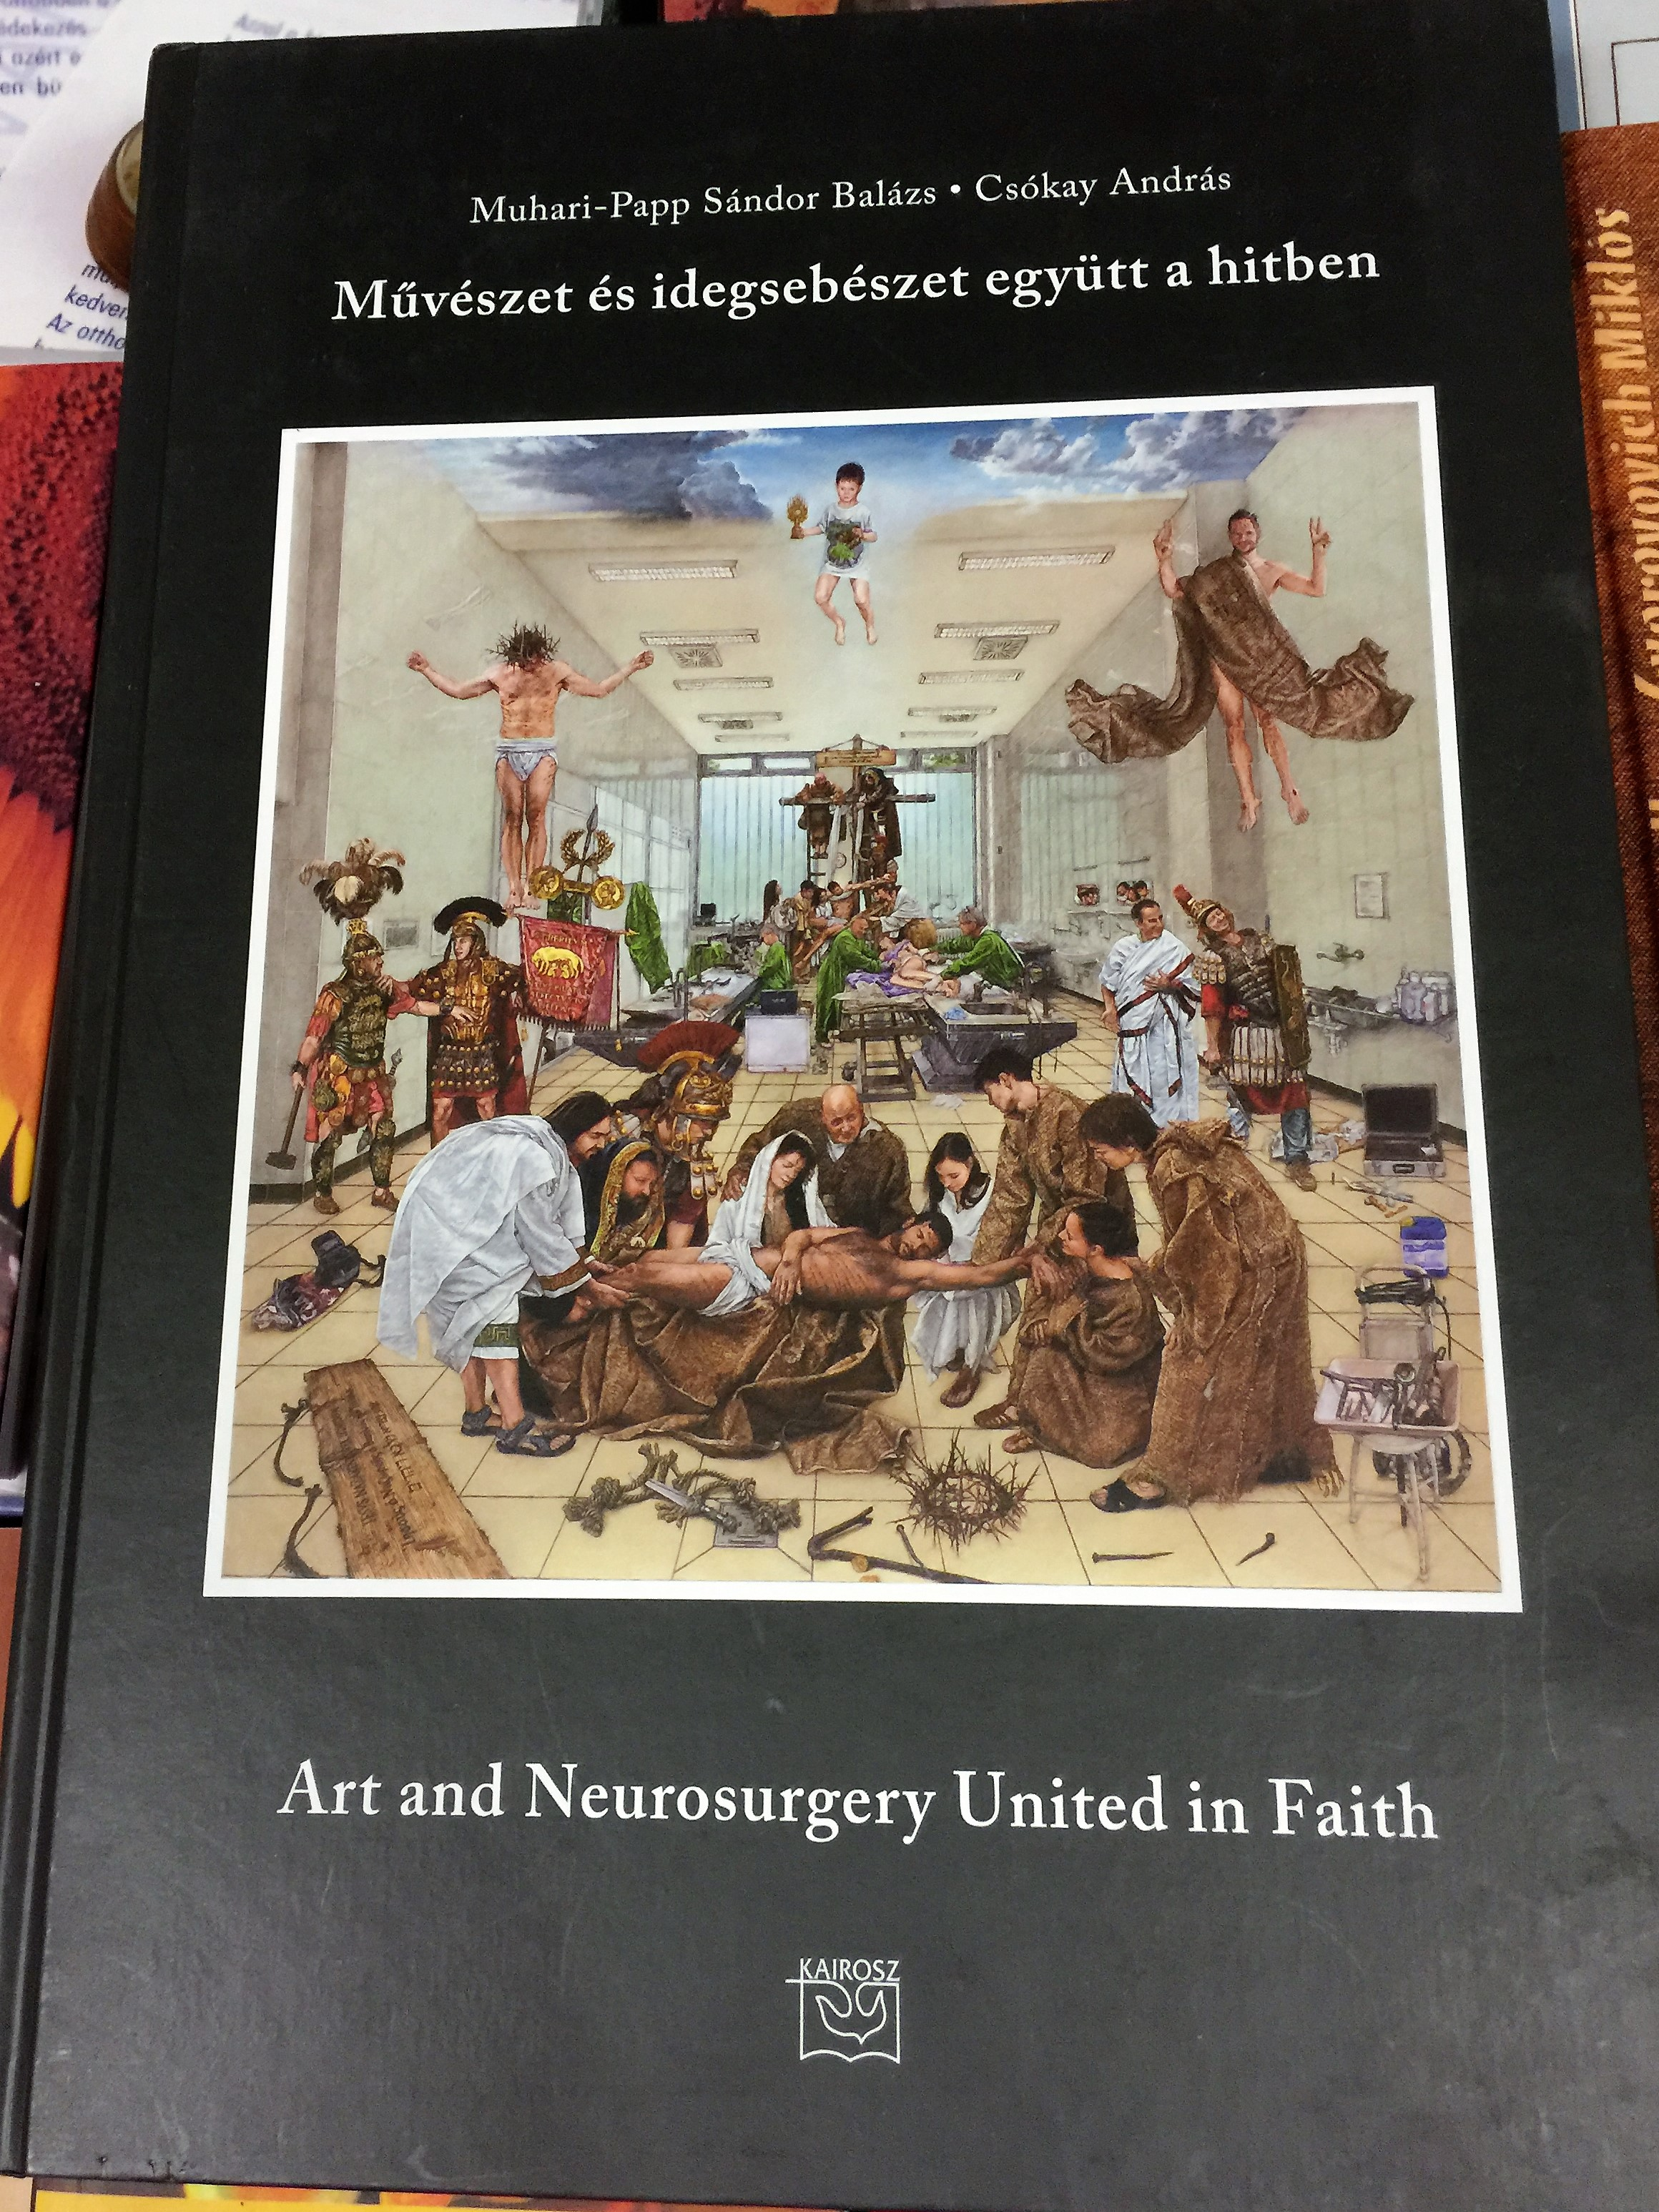 m-v-szet-s-idegseb-szet-egy-tt-a-hitben-muhari-papp-s-ndor-bal-zs-cs-kay-andr-s-art-and-neourosurgery-united-in-faith-second-extended-edition-hardcover-kairosz-2015-1-.jpg